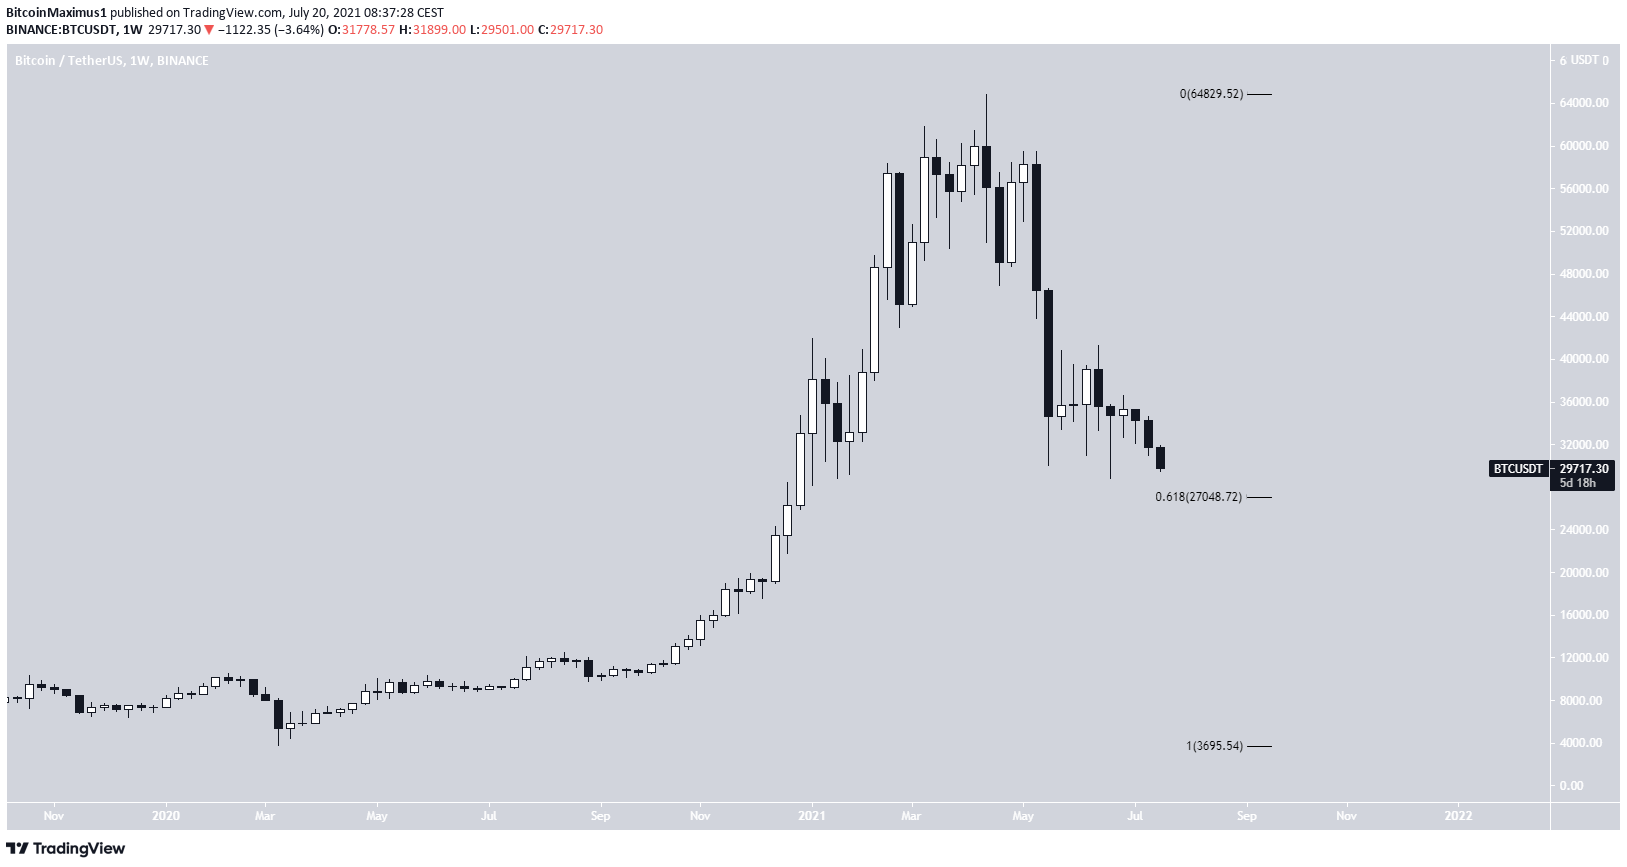 BTC long-term support